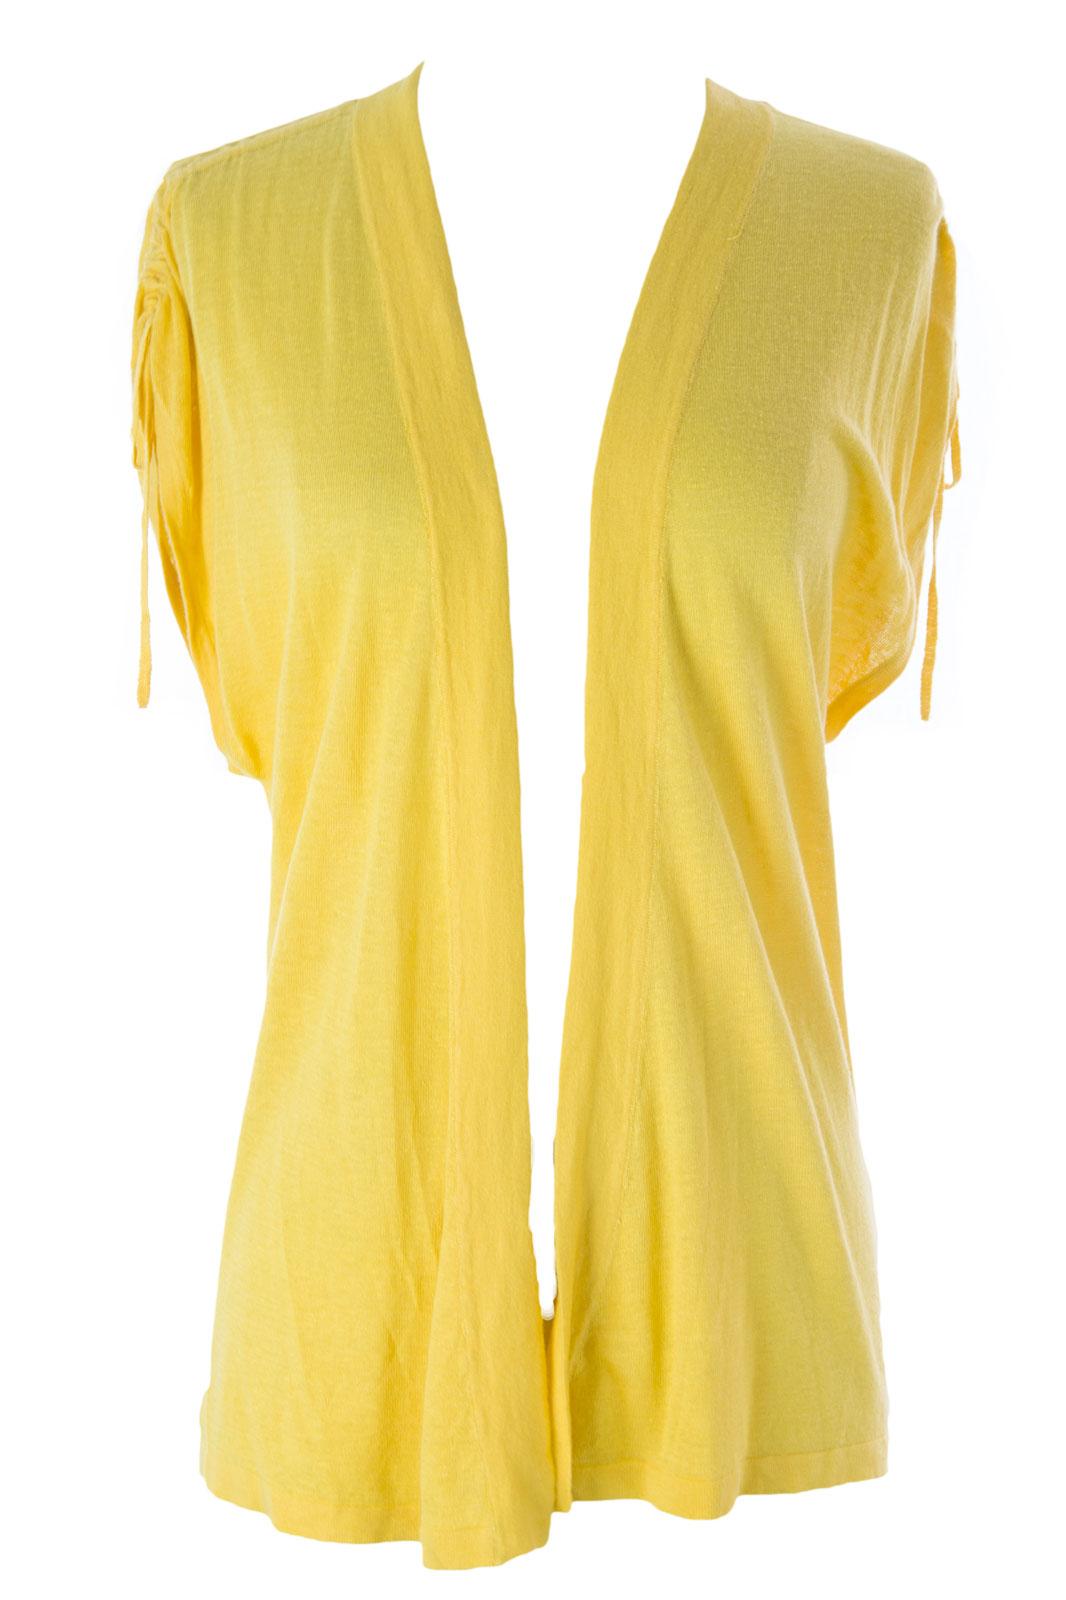 August Silk Women's Petite Ruched Tie String Flyaway Cardigan PM ...